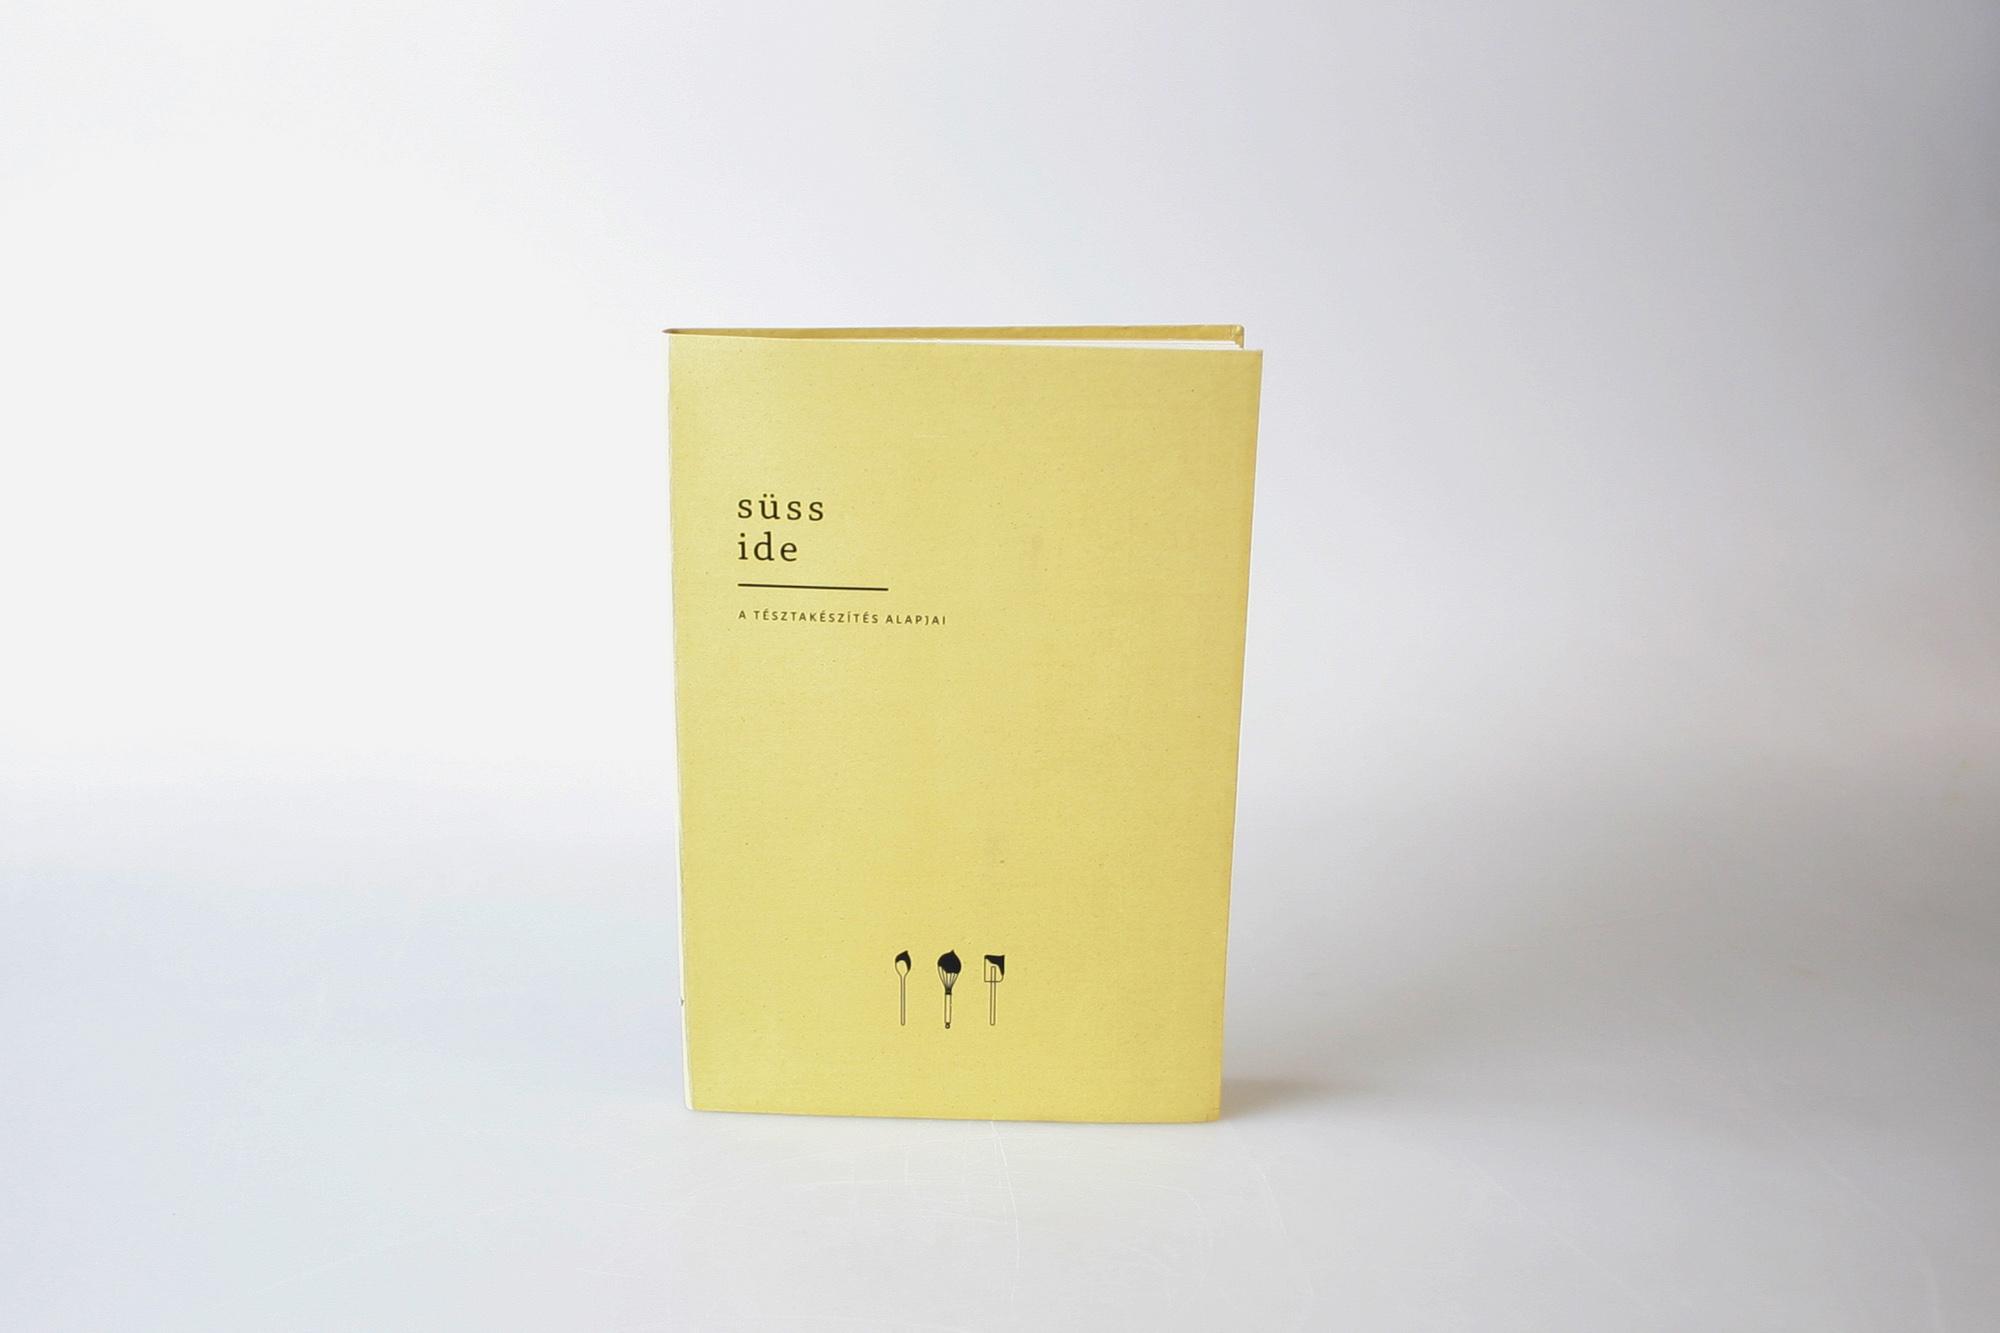 rosta emese receipt-book 01.jpg